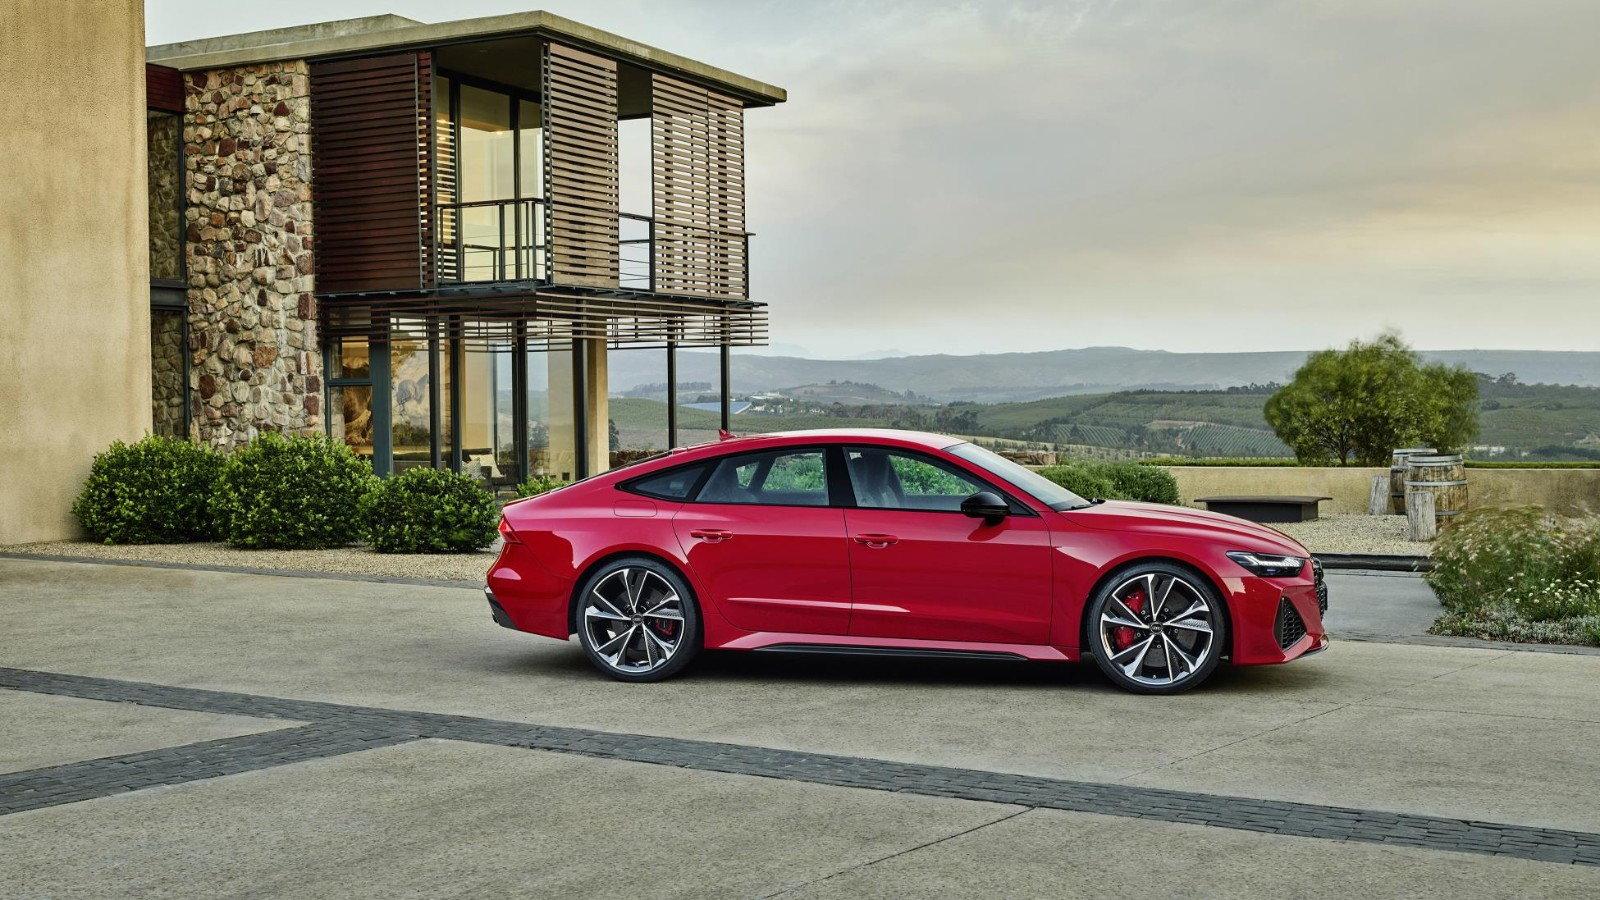 2020 Audi Rs7 Sportback Is A 4 Door Performance Specialist Audiworld